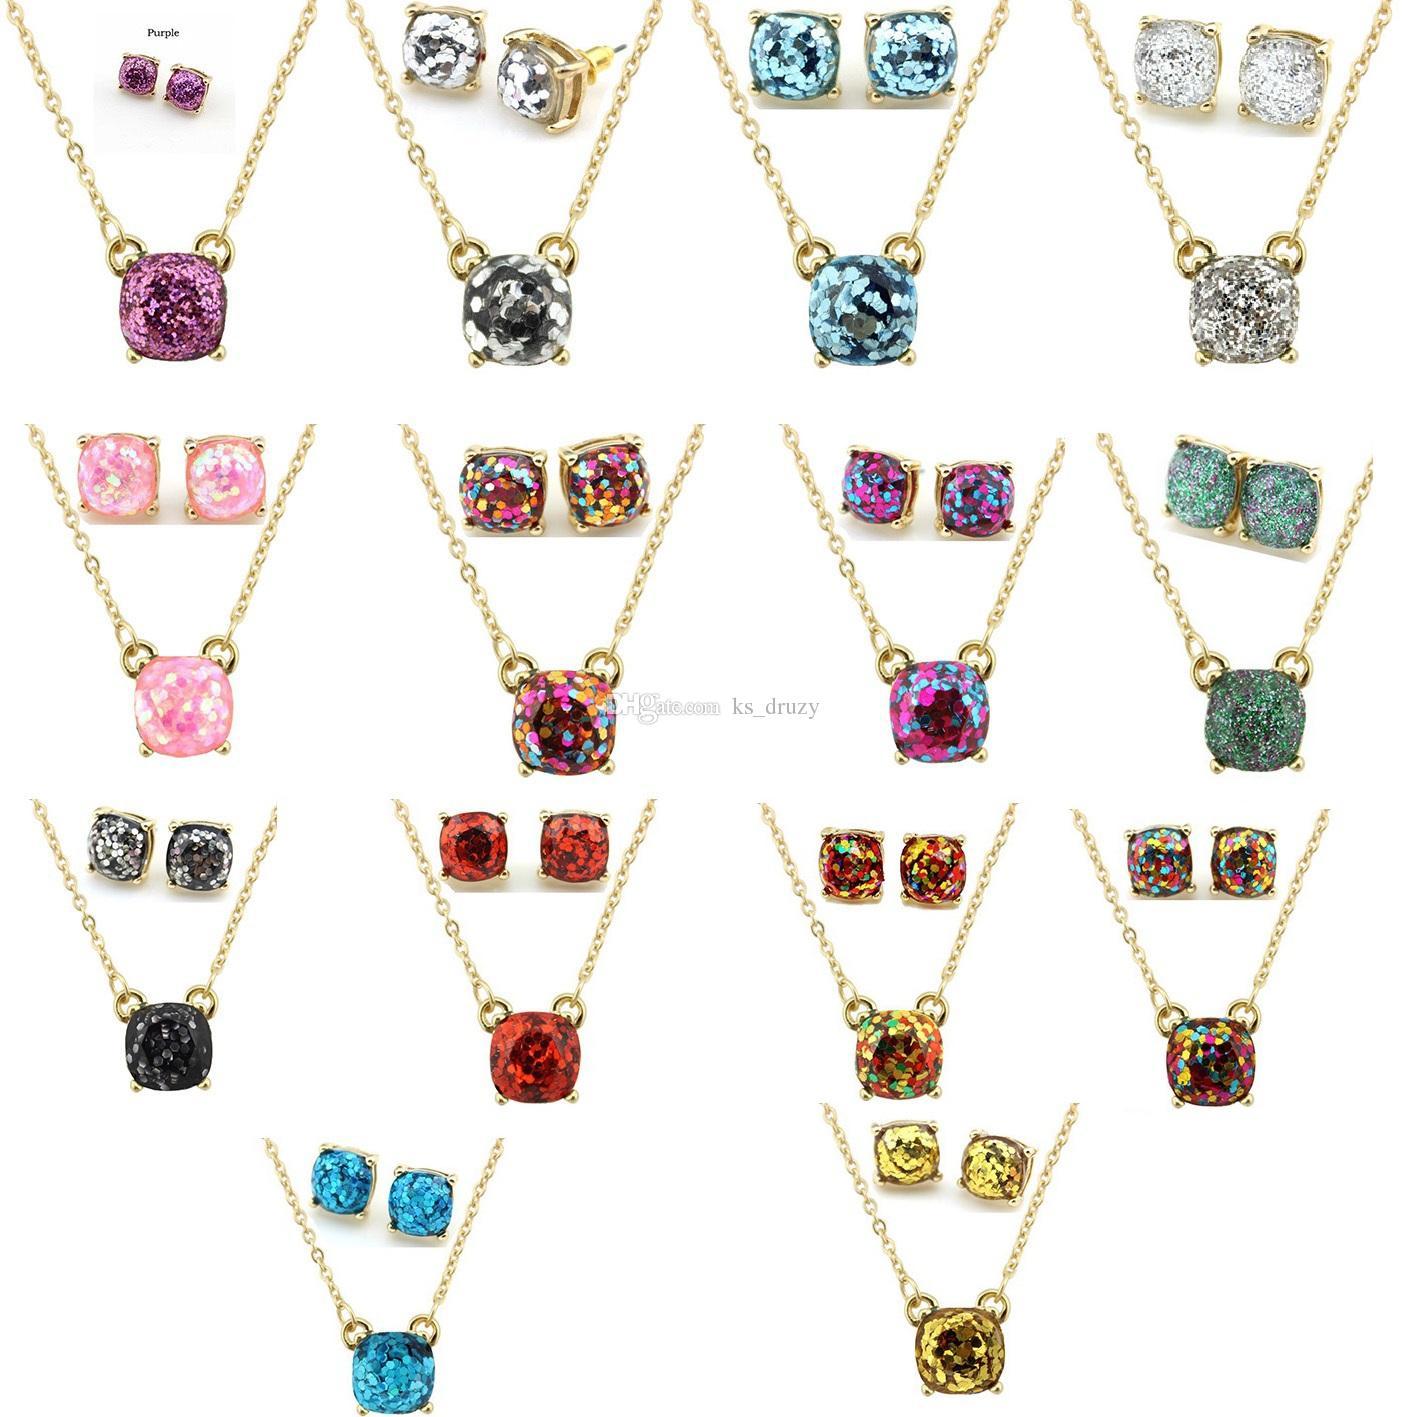 Großhandel 14 Farben Kate Square Galaxy Glitter Gold Halskette ...